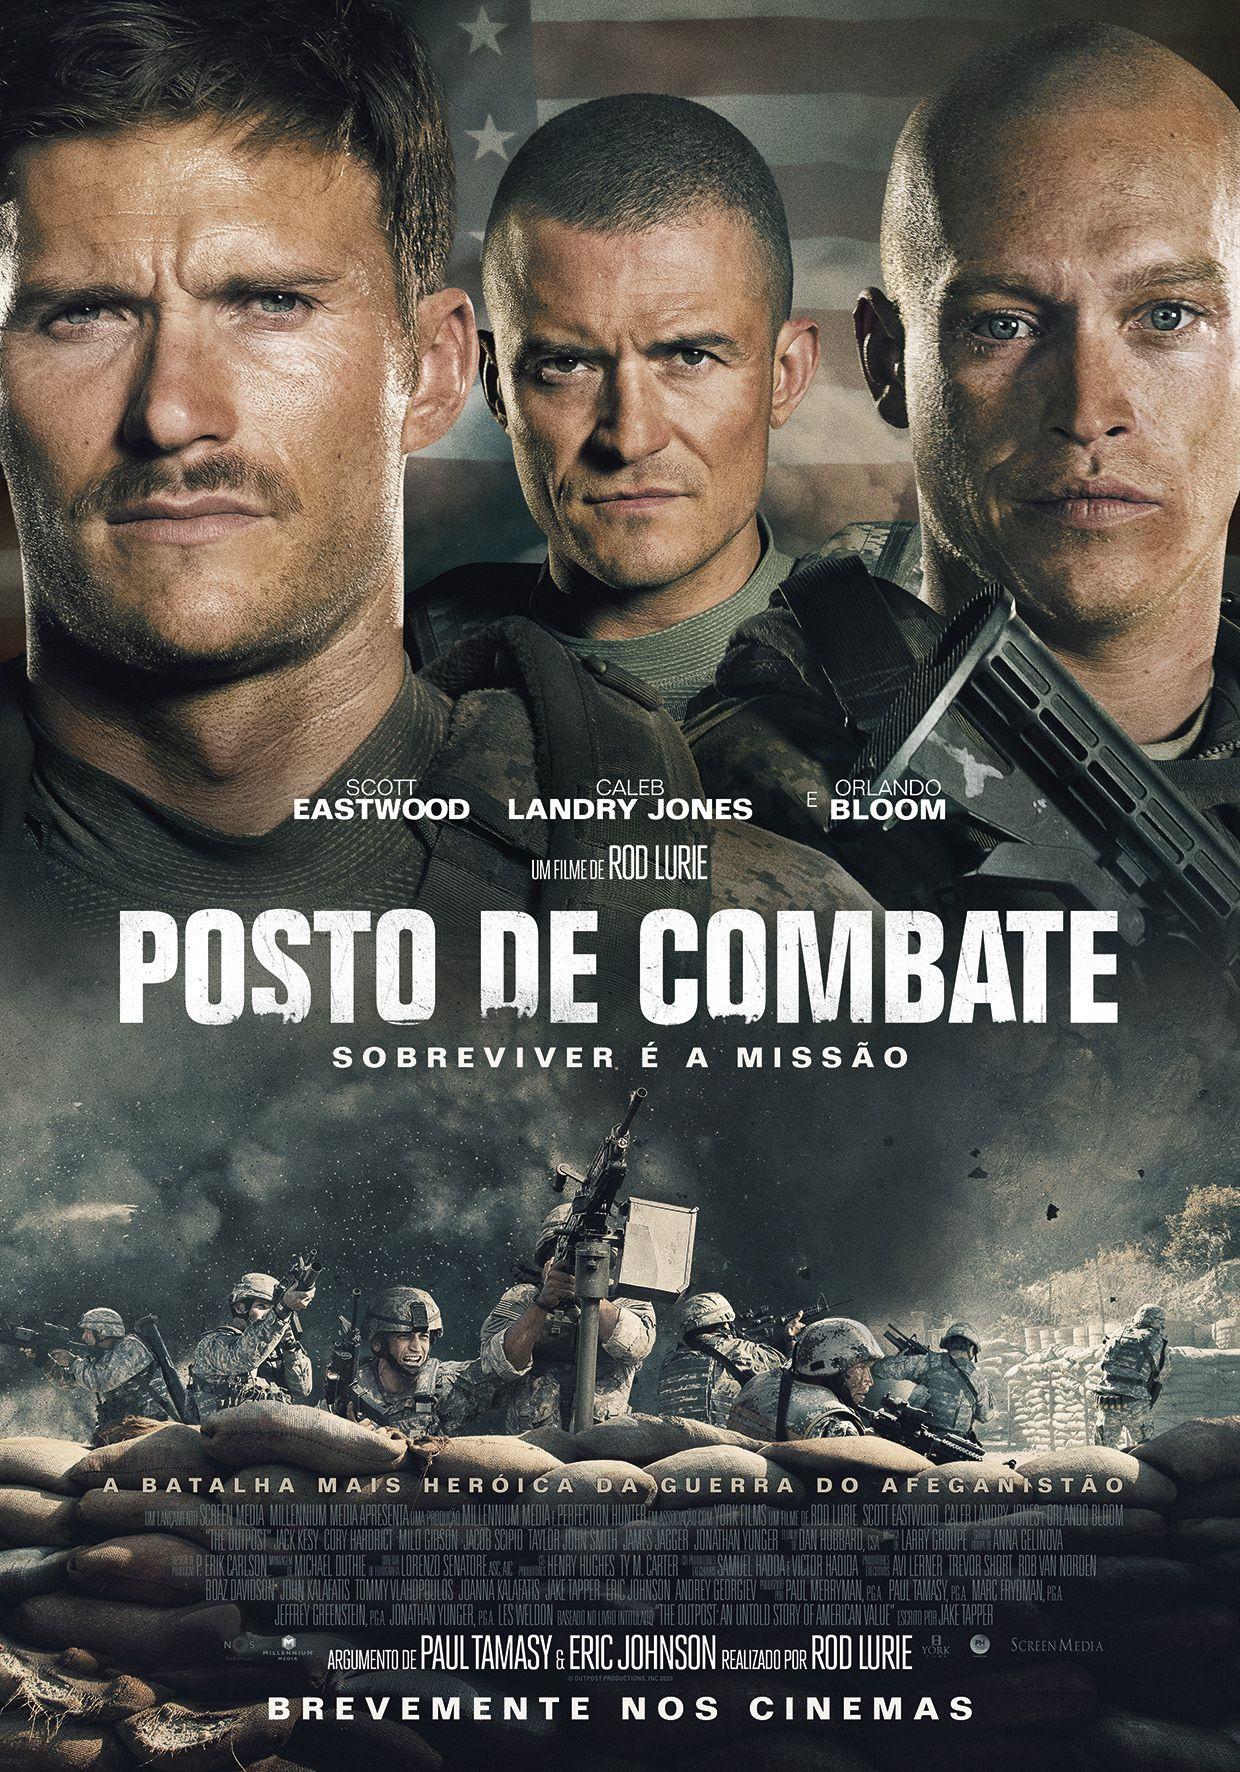 Posto De Combate Assistir Filmes Gratis Assistir Filmes Gratis Online Filmes Online Gratis